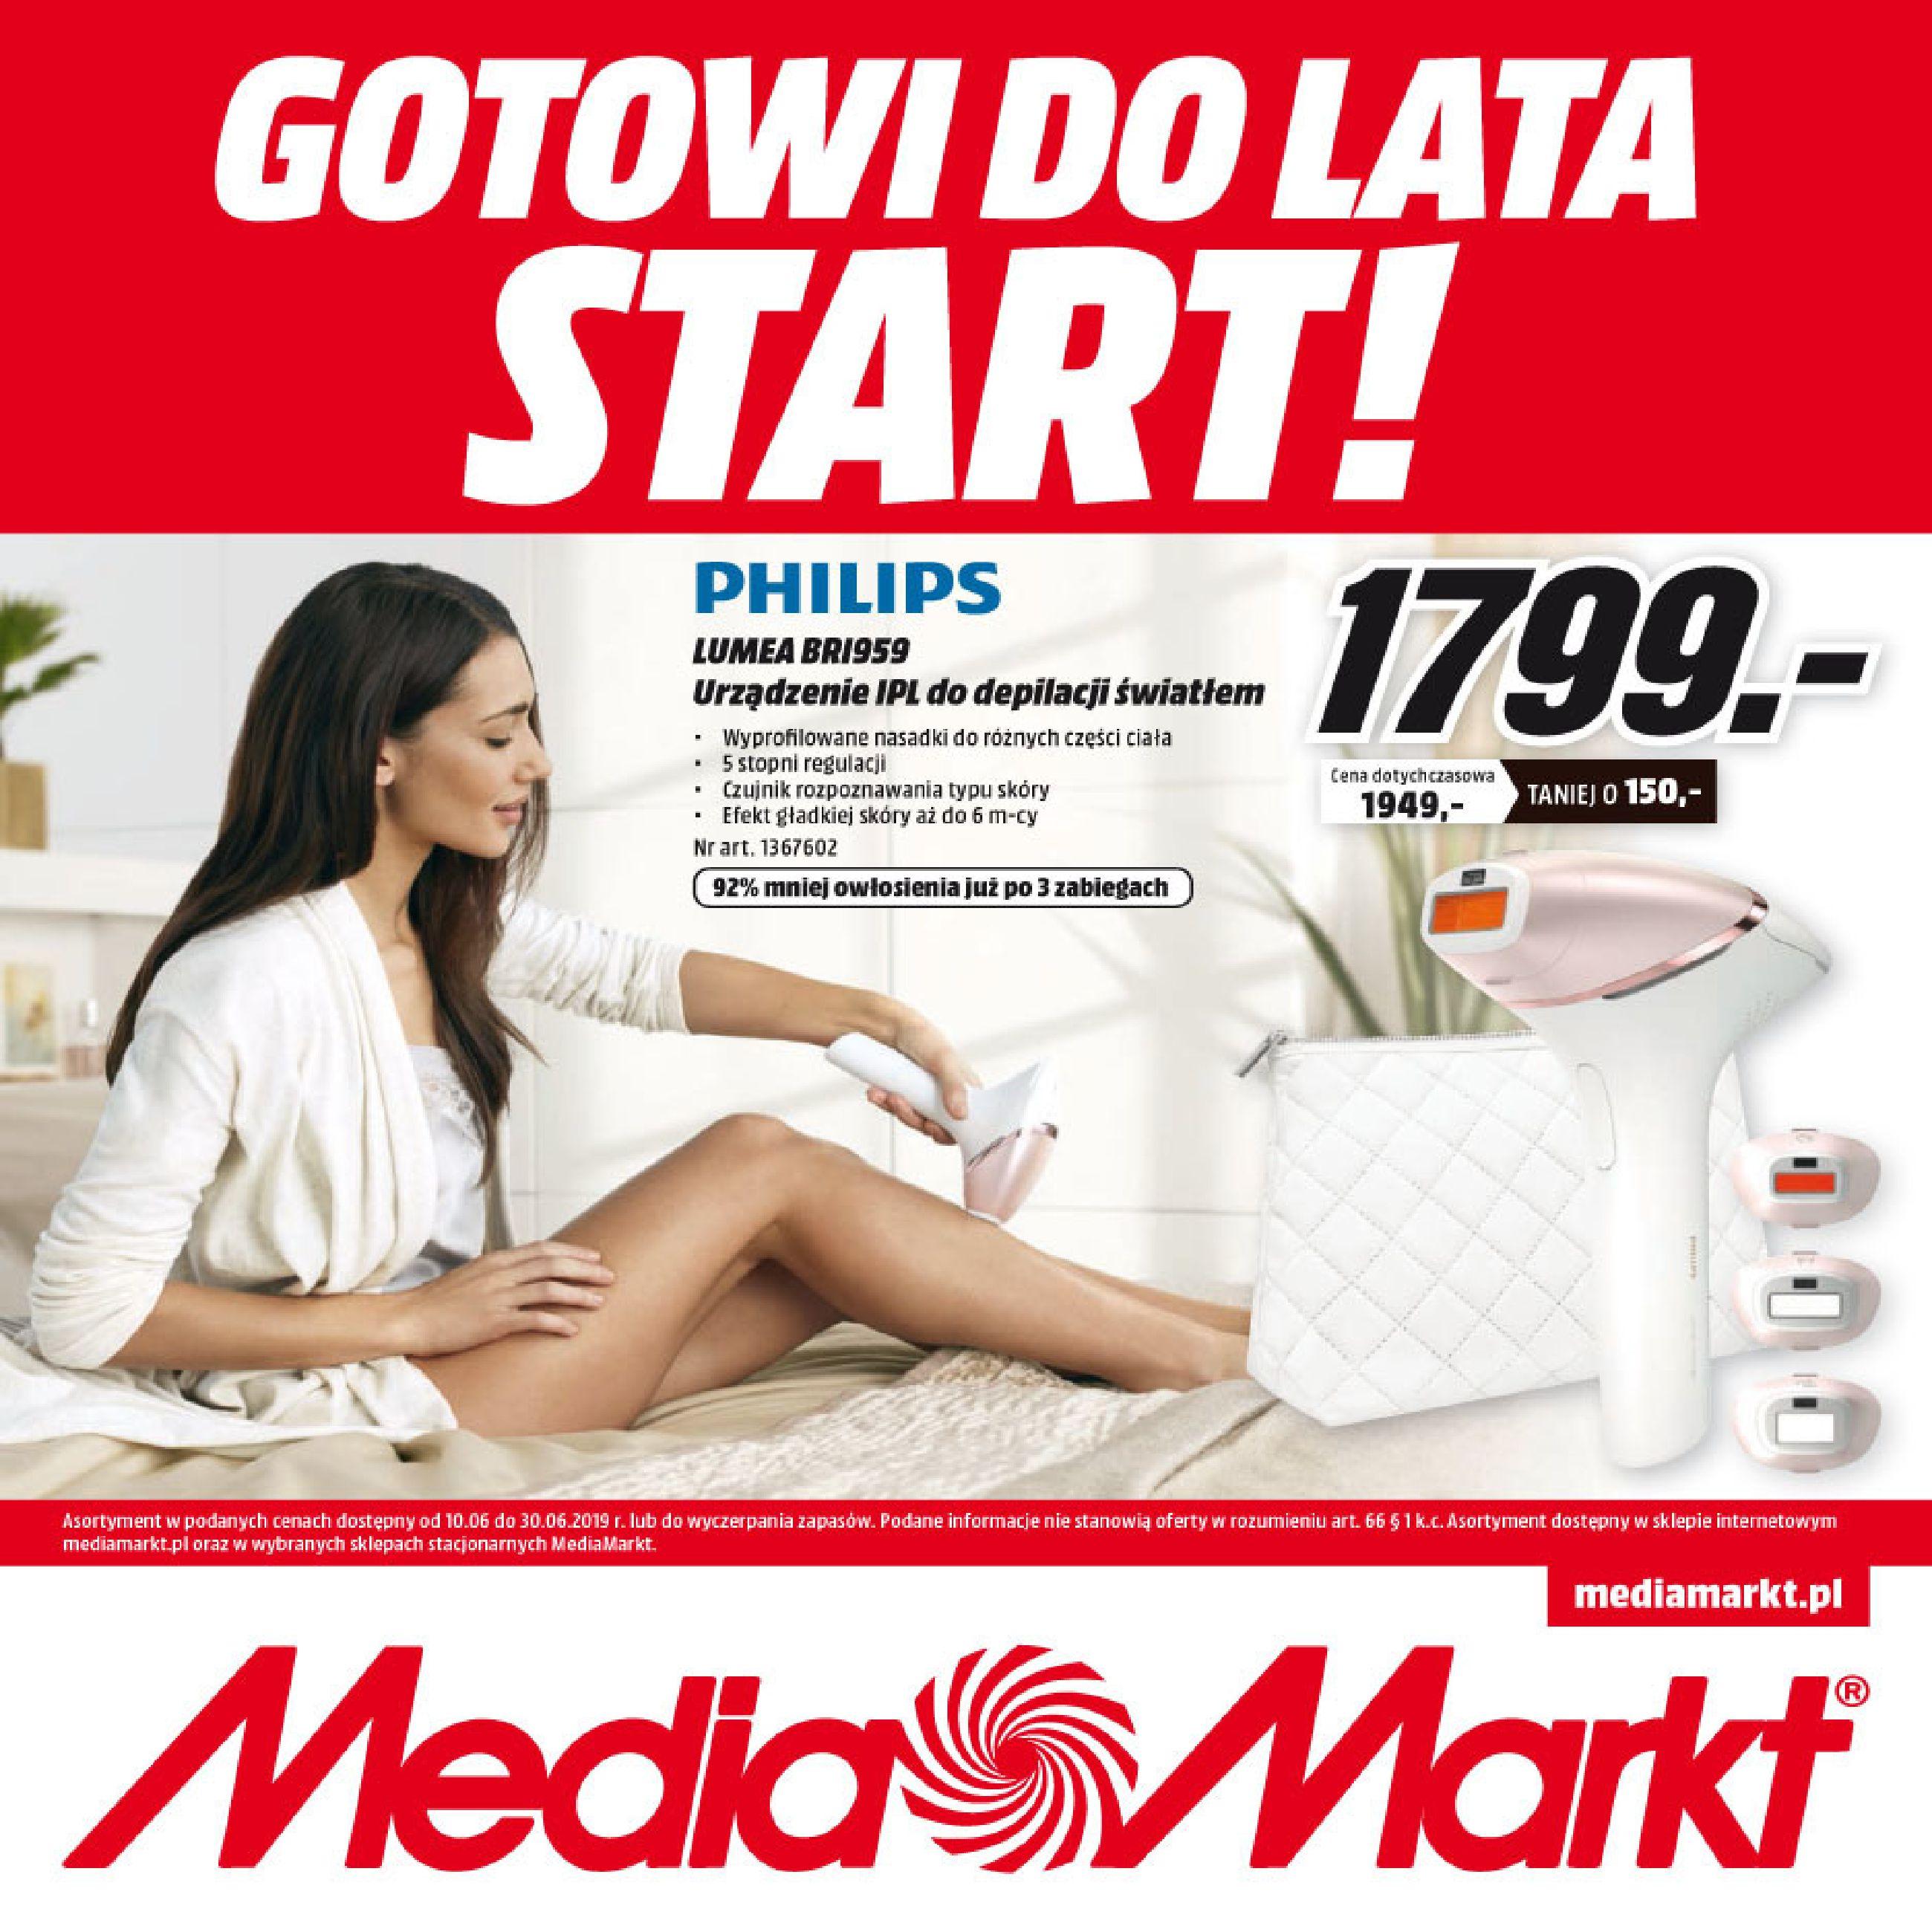 Gazetka Media Markt - Gotowi do lata, start!-09.06.2019-30.06.2019-page-